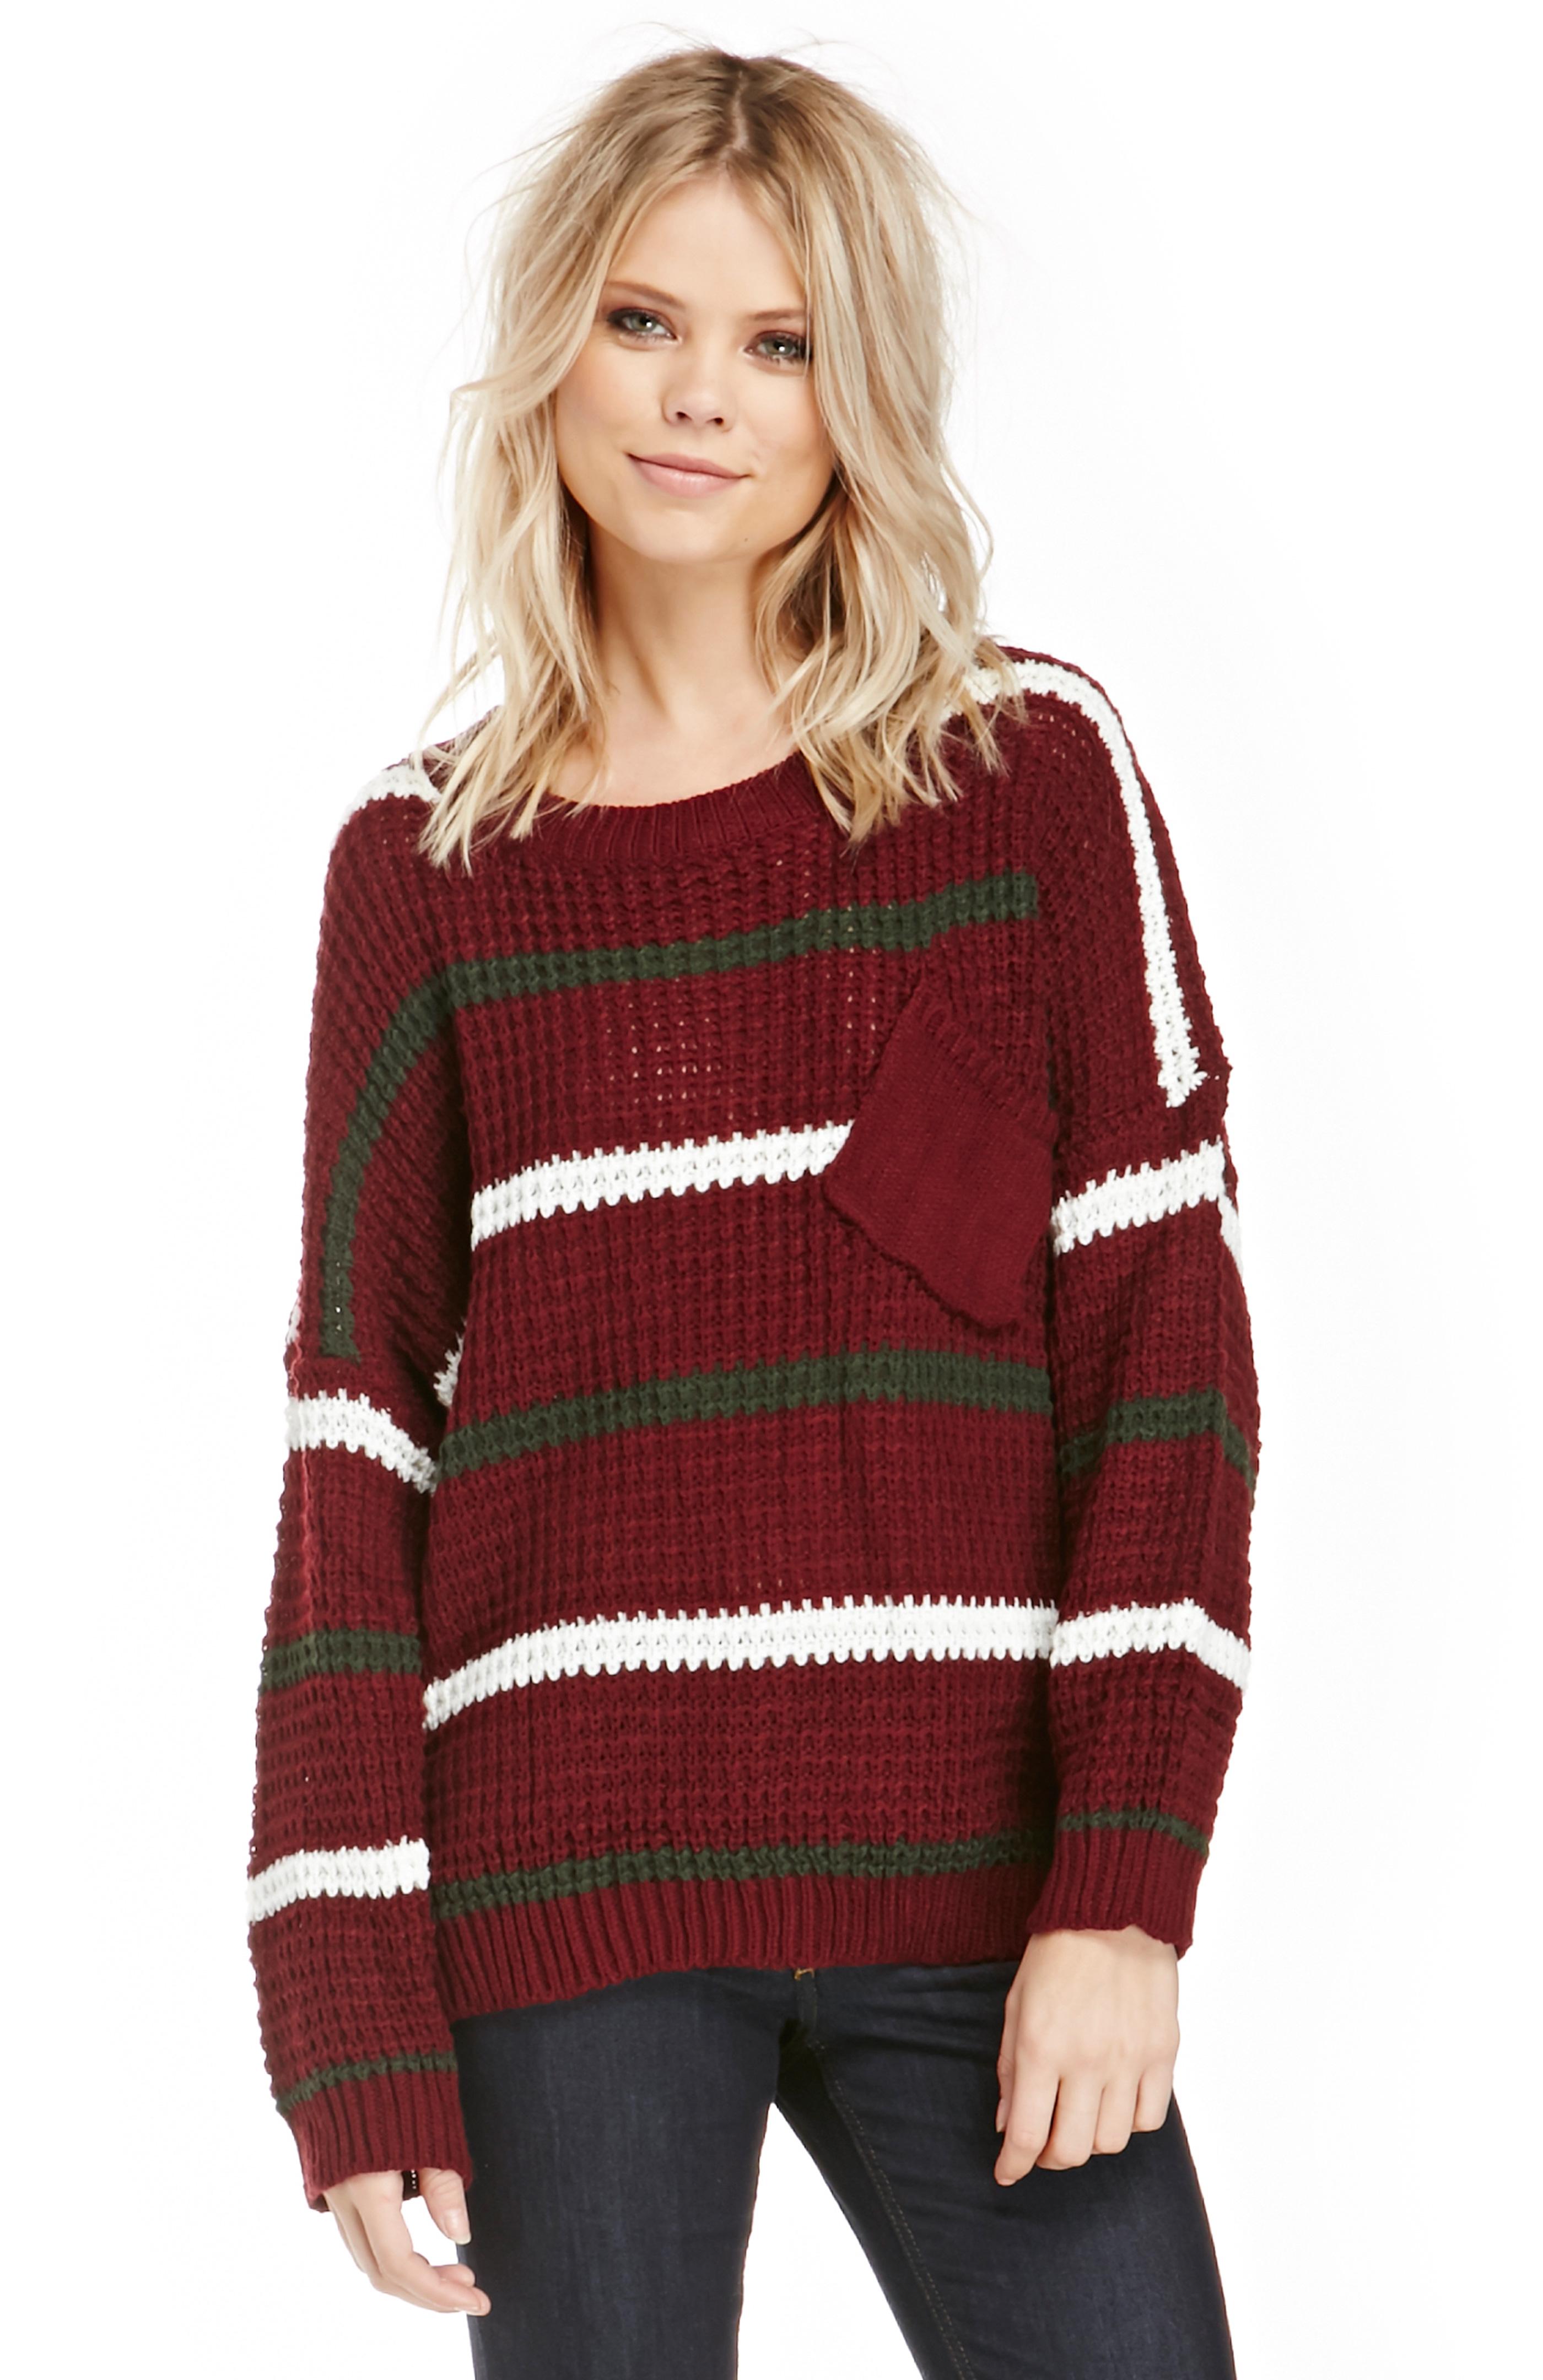 87e899f2a5219 Striped Knit Varsity Sweater in Burgundy